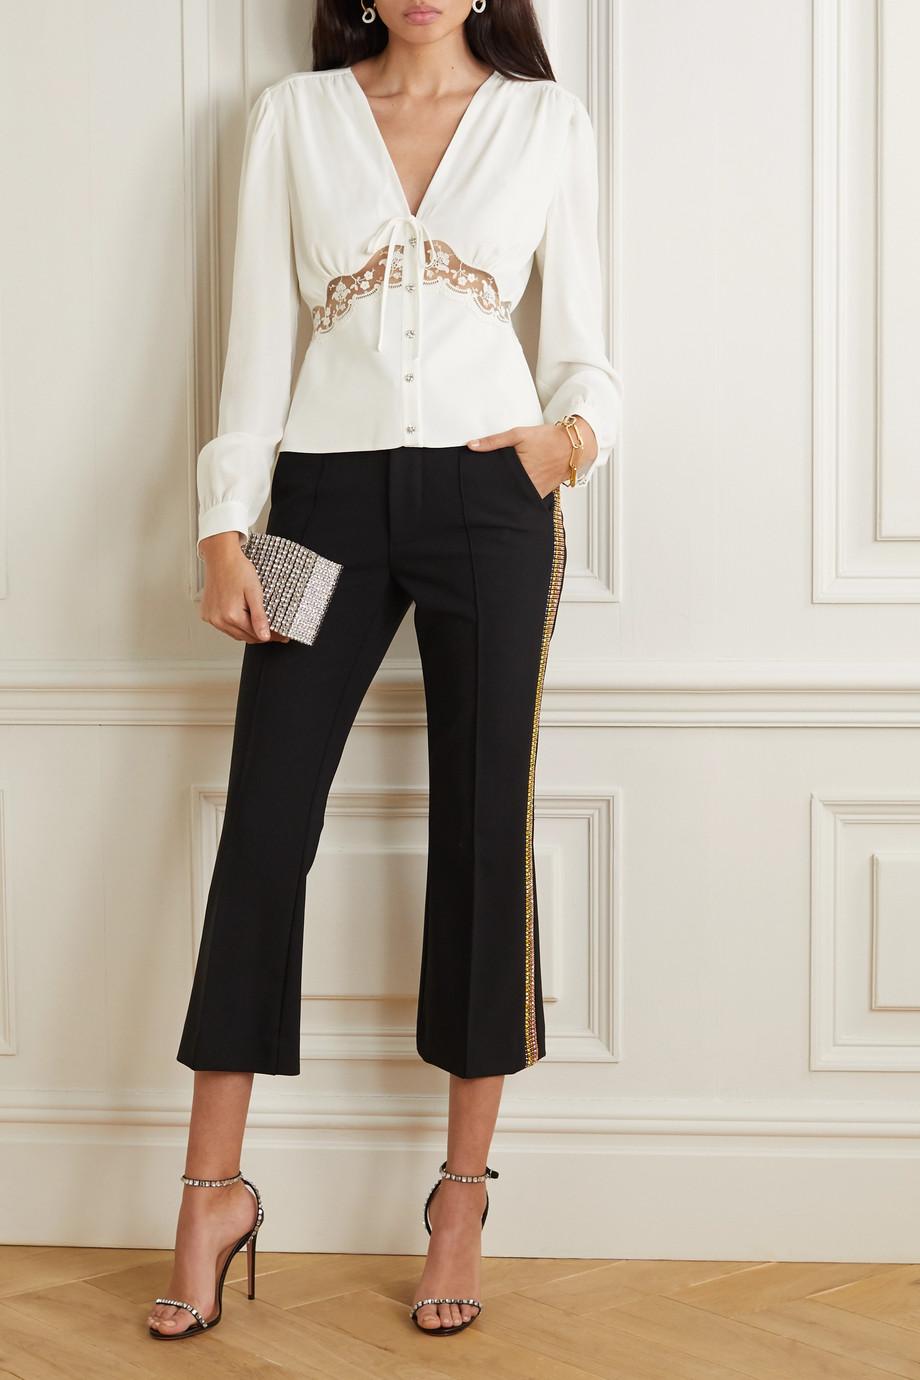 Miu Miu Crystal-embellished lace-trimmed crepe blouse